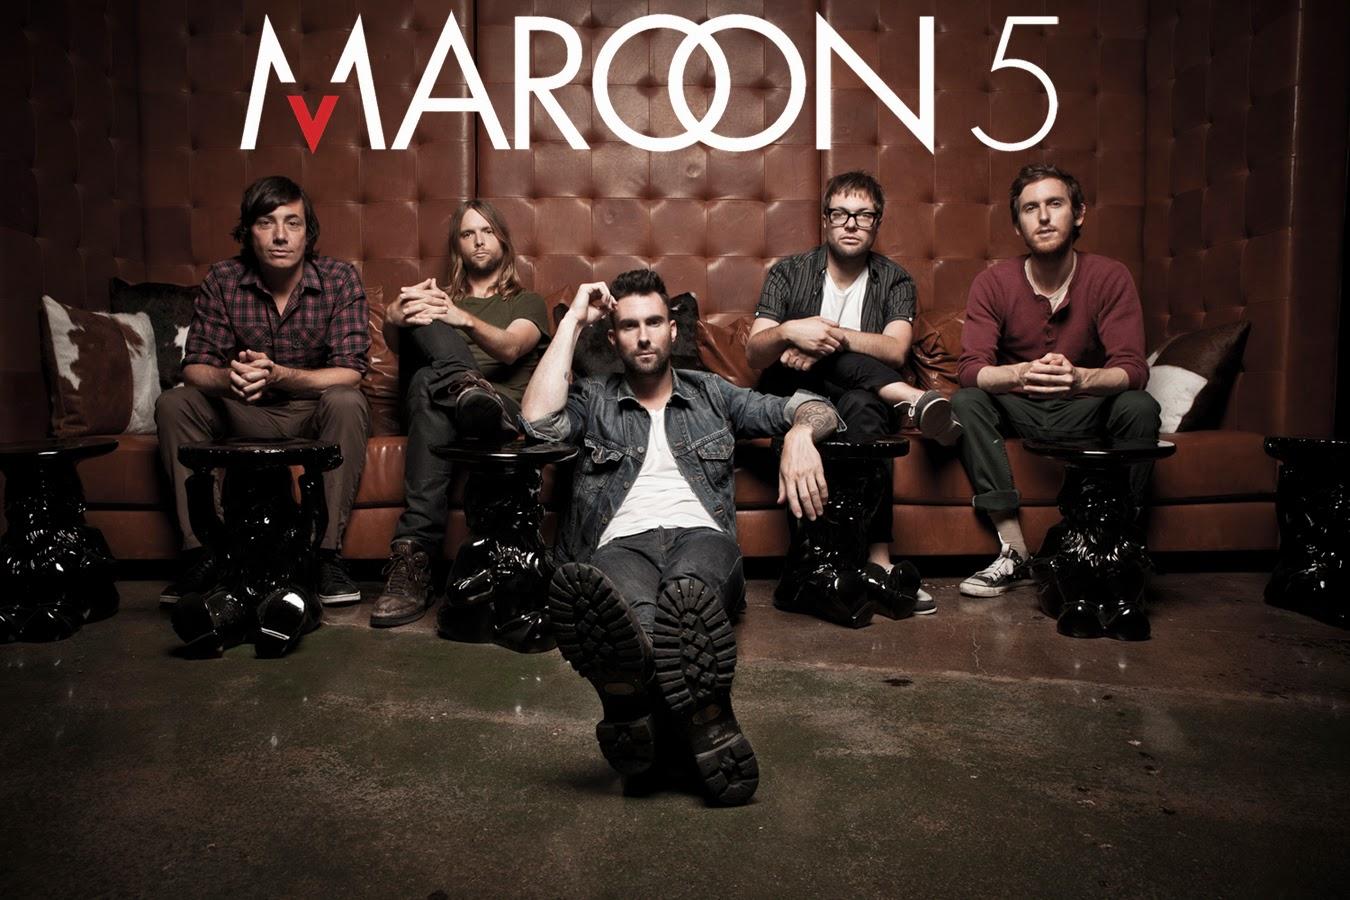 Adam Levine Maroon 5 band poster